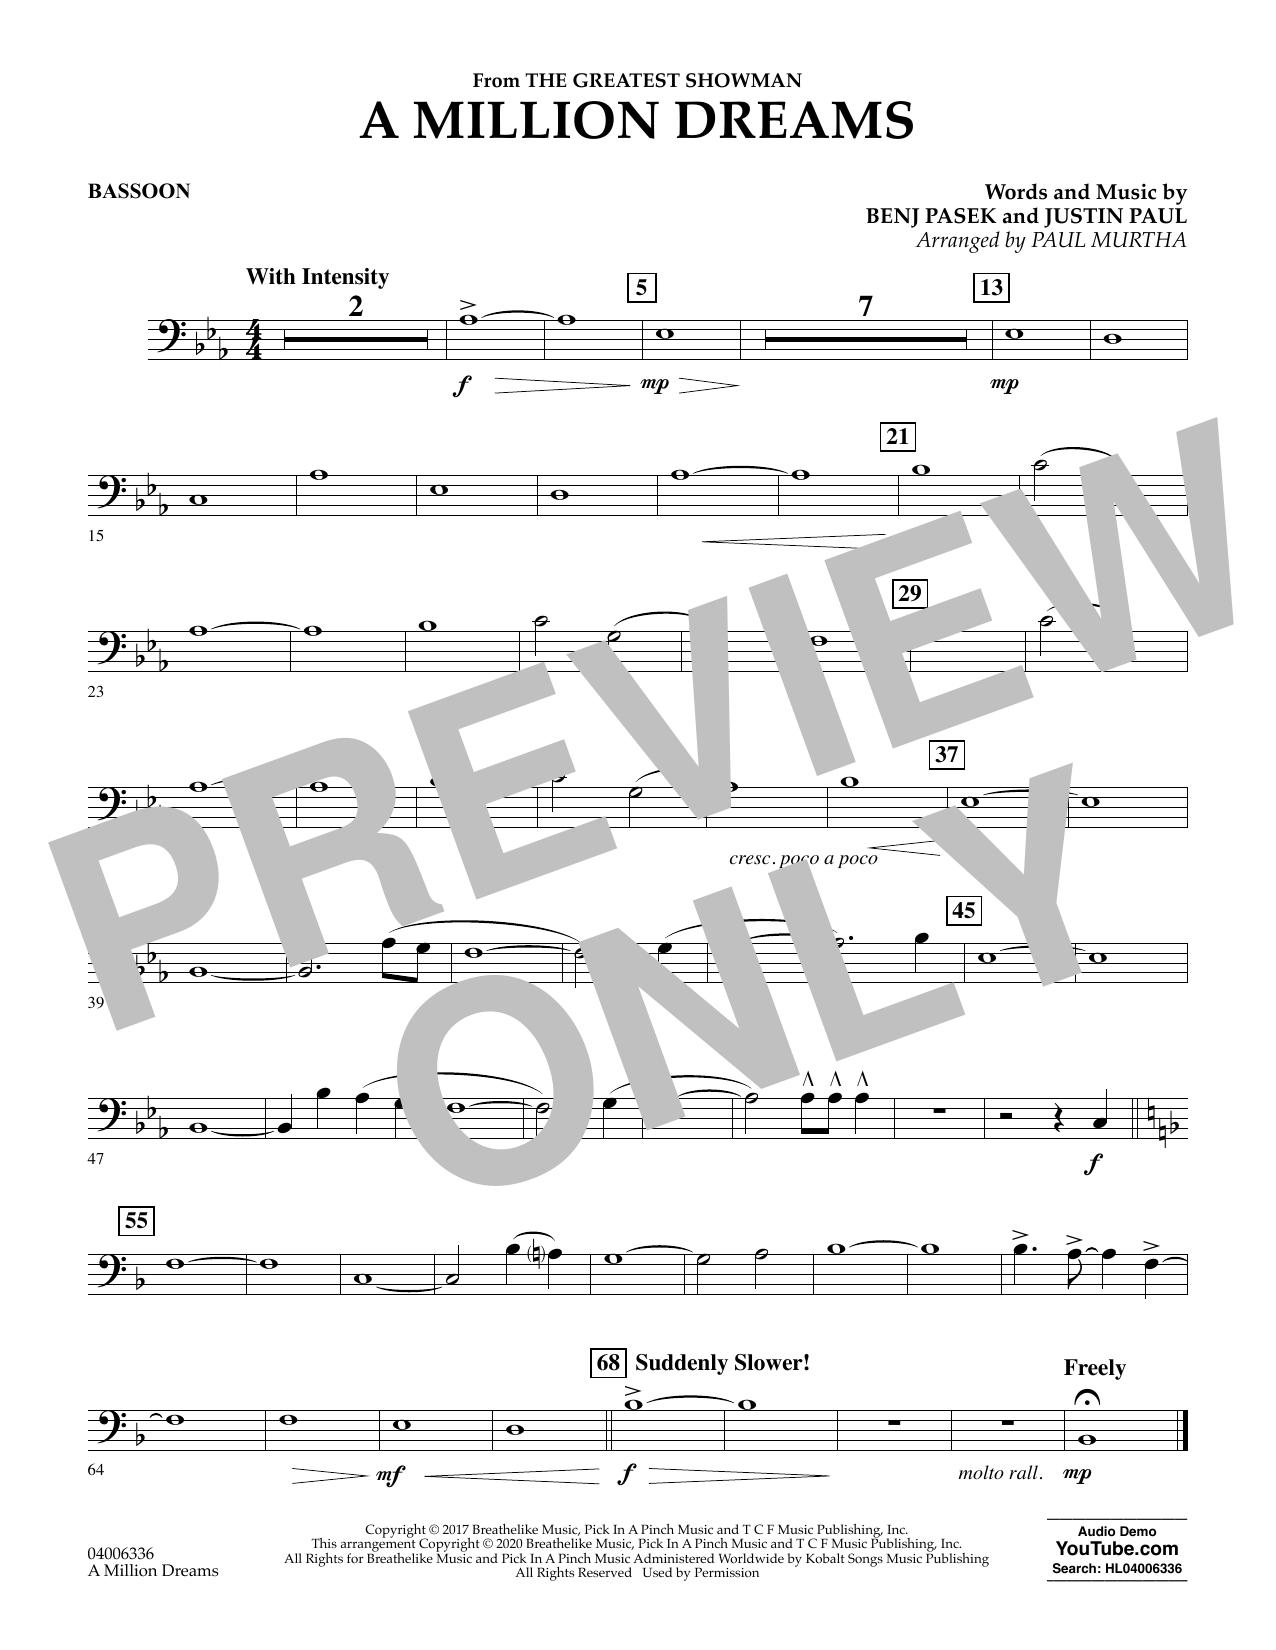 A Million Dreams (from The Greatest Showman) (arr. Paul Murtha) - Bassoon (Concert Band)